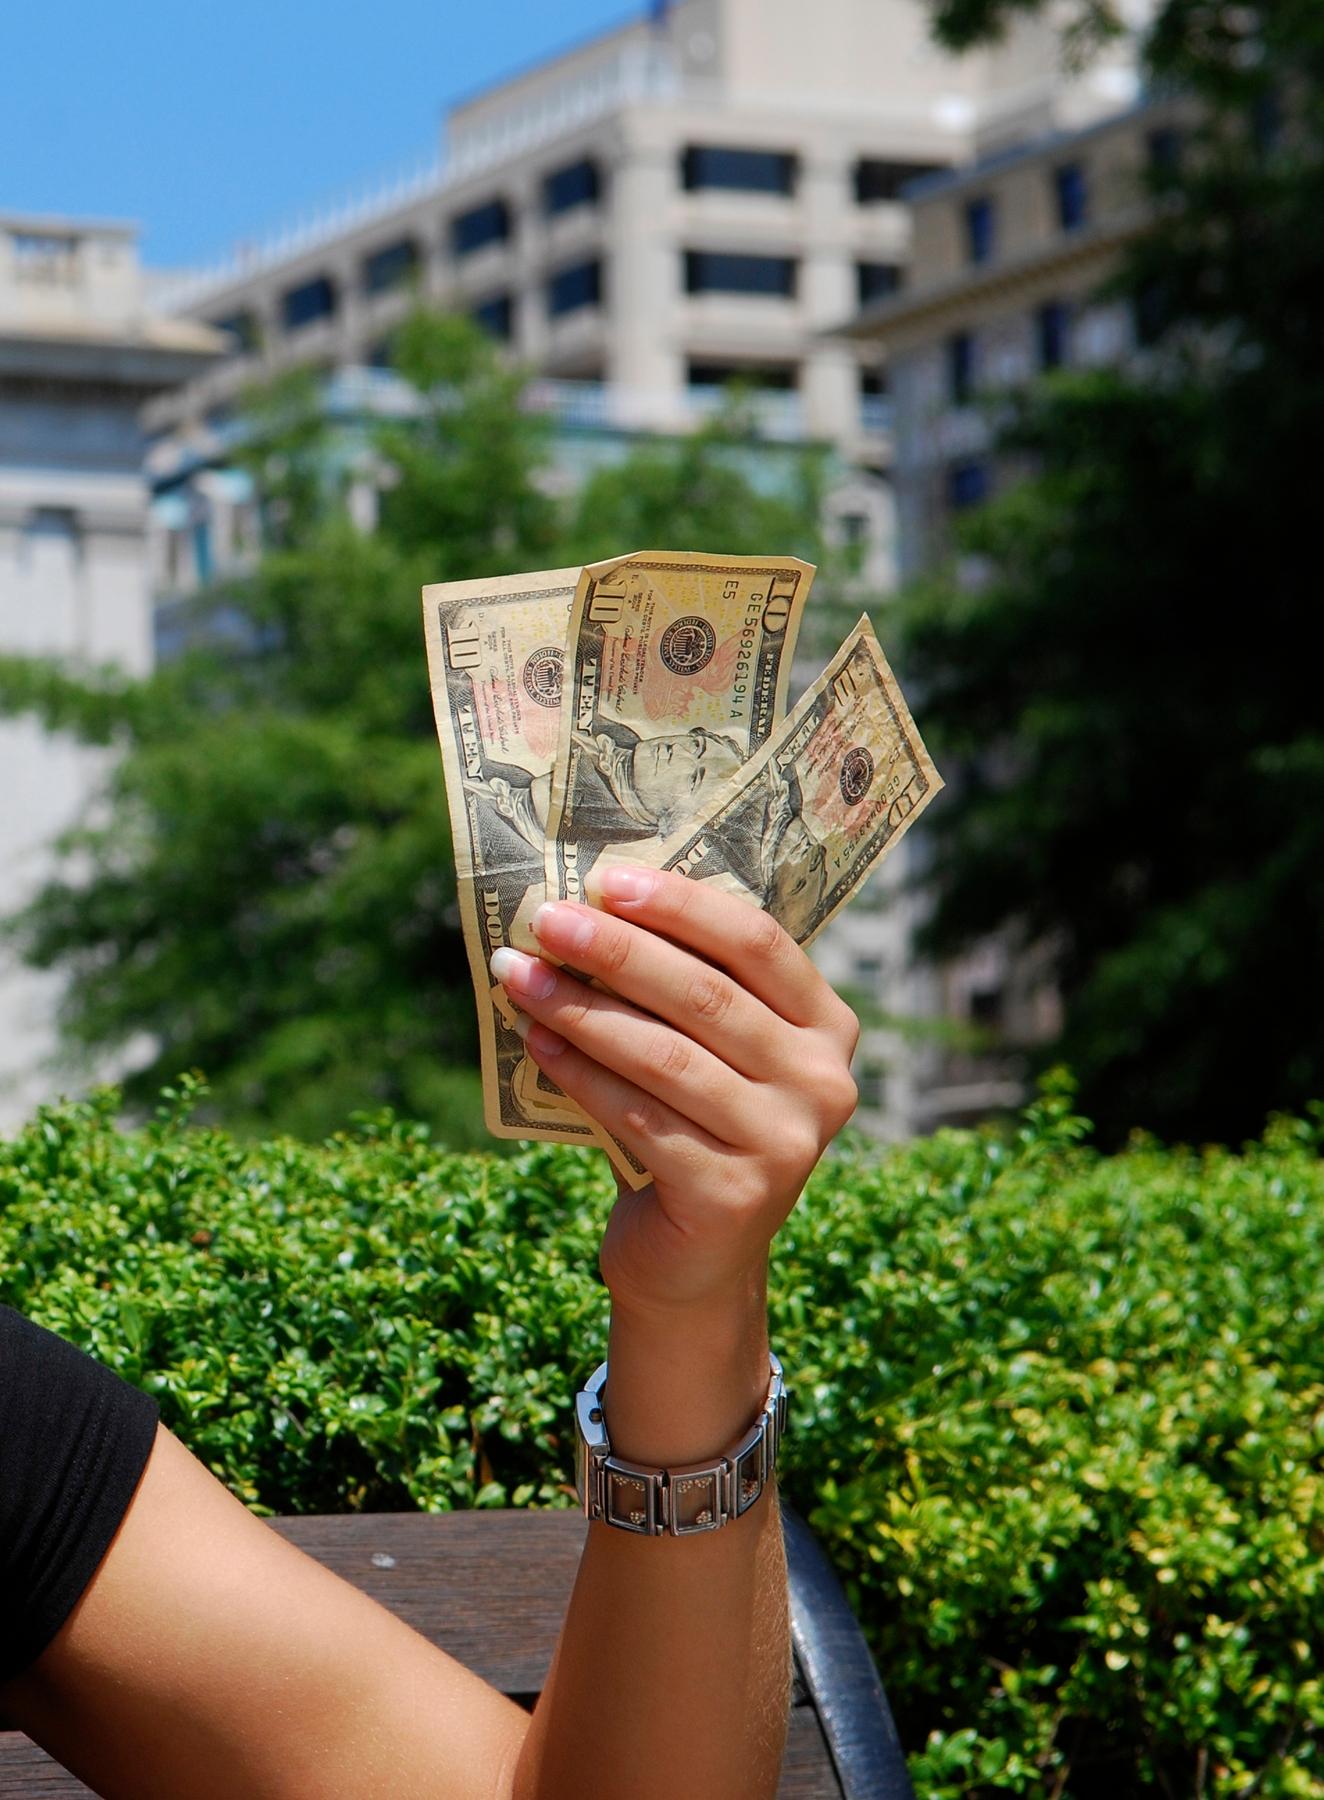 a female hand holds three ten-dollar bills as a potential flight refund